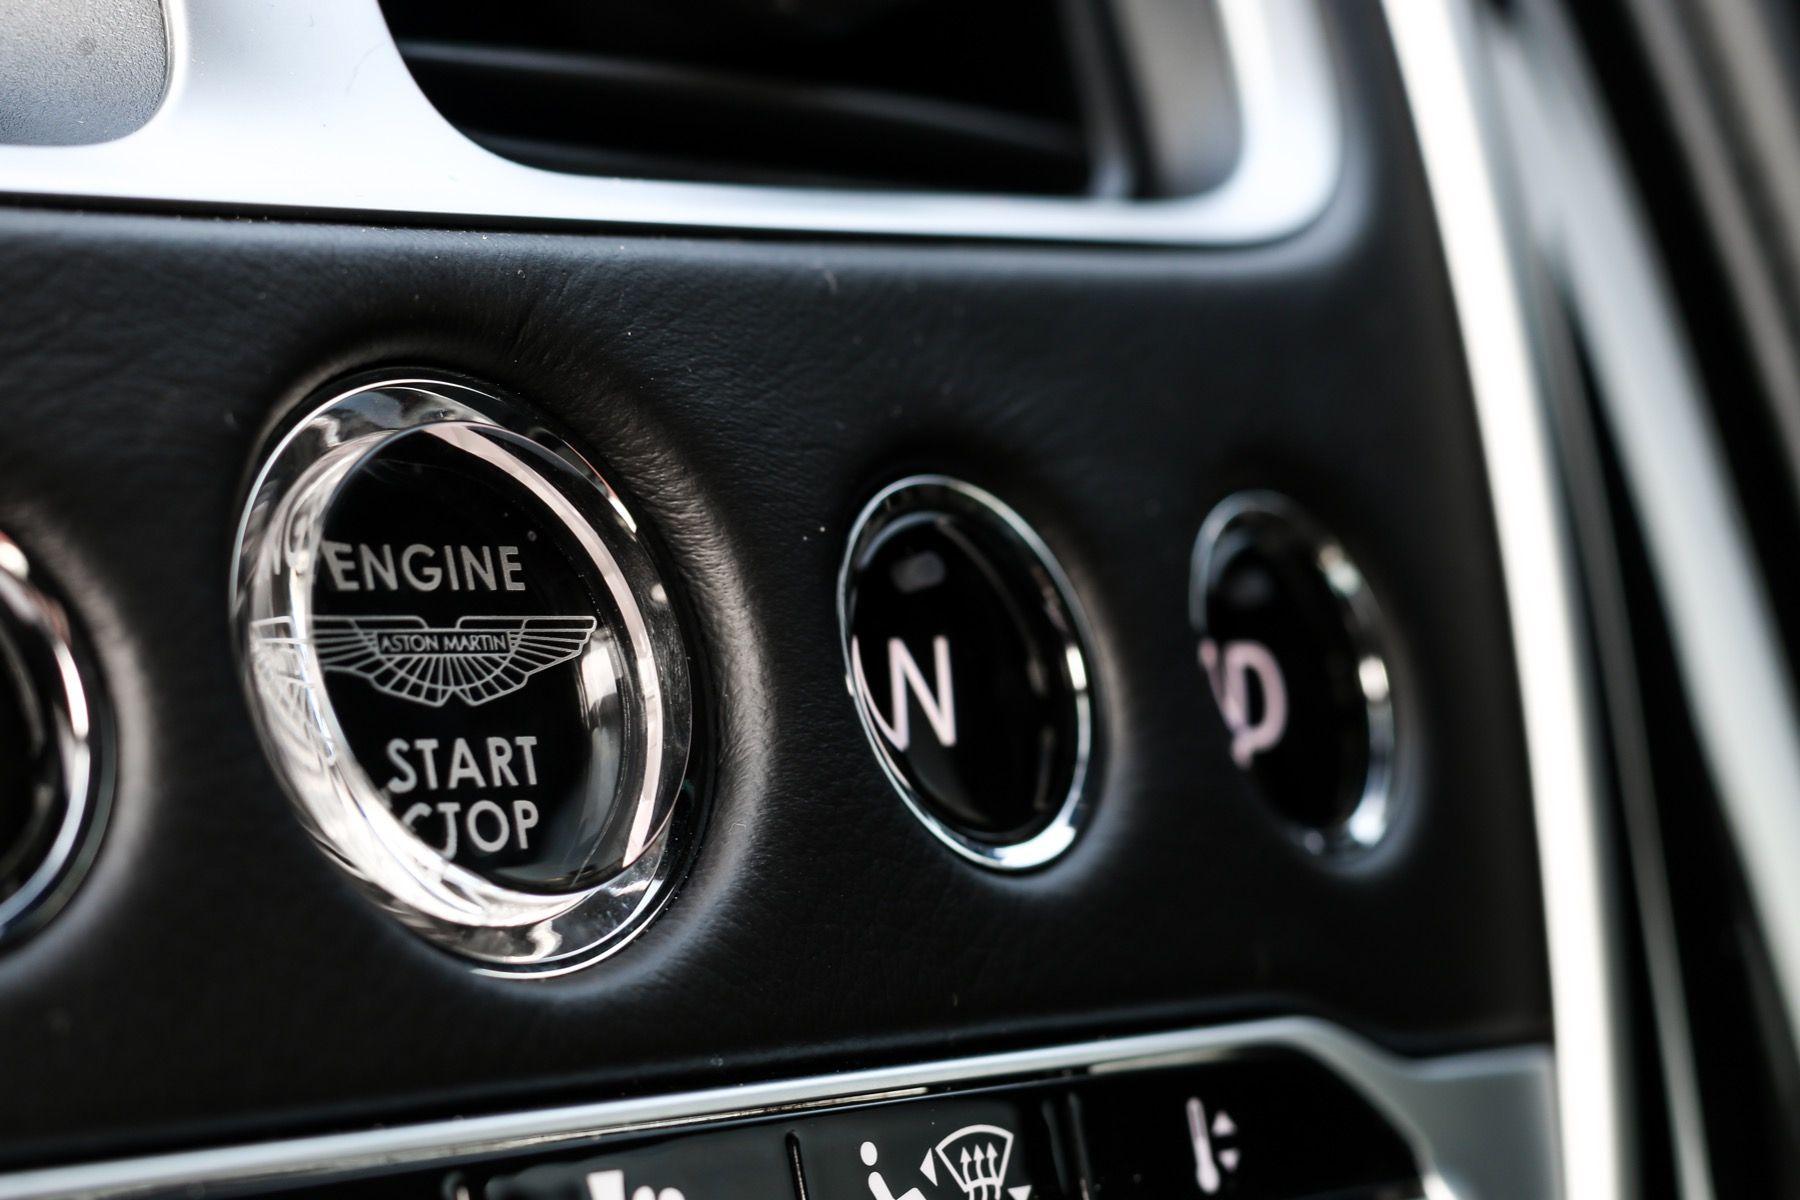 Aston Martin DBS V12 Superleggera 2dr Touchtronic image 29